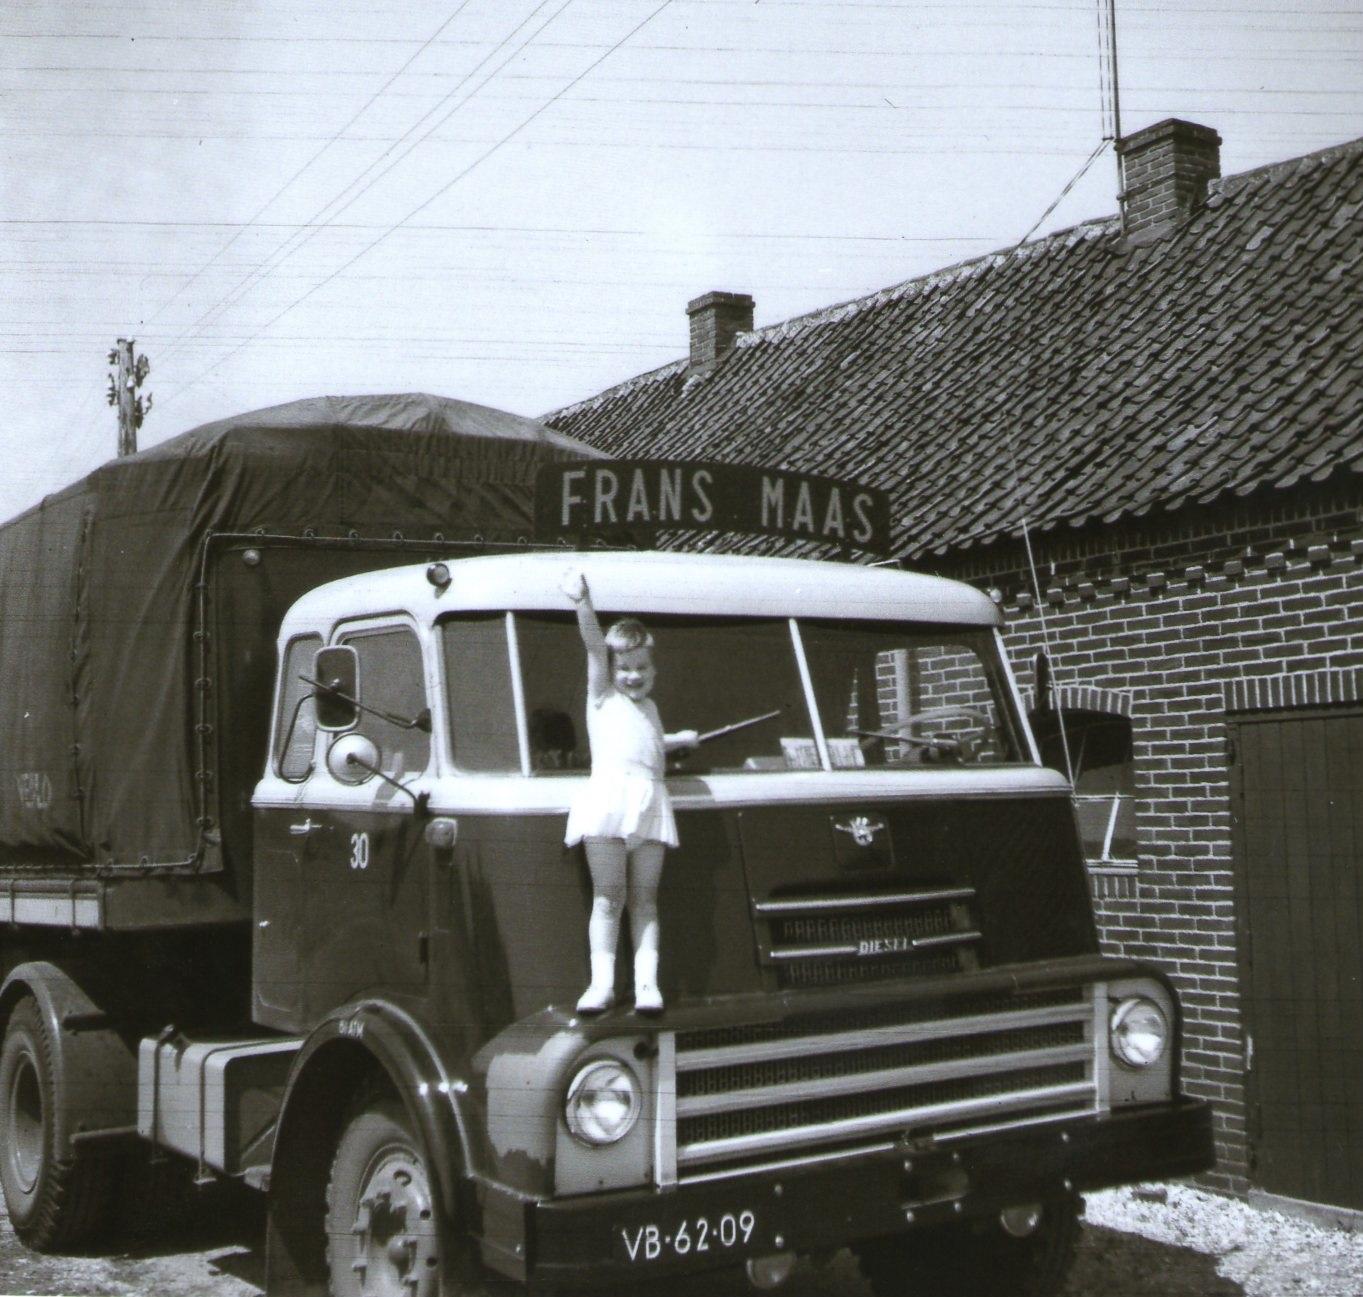 Frans-Maas-Daf-2000-DO-nr-2-Petra-Dochter-van-Haij-Luijpers-chauffeur